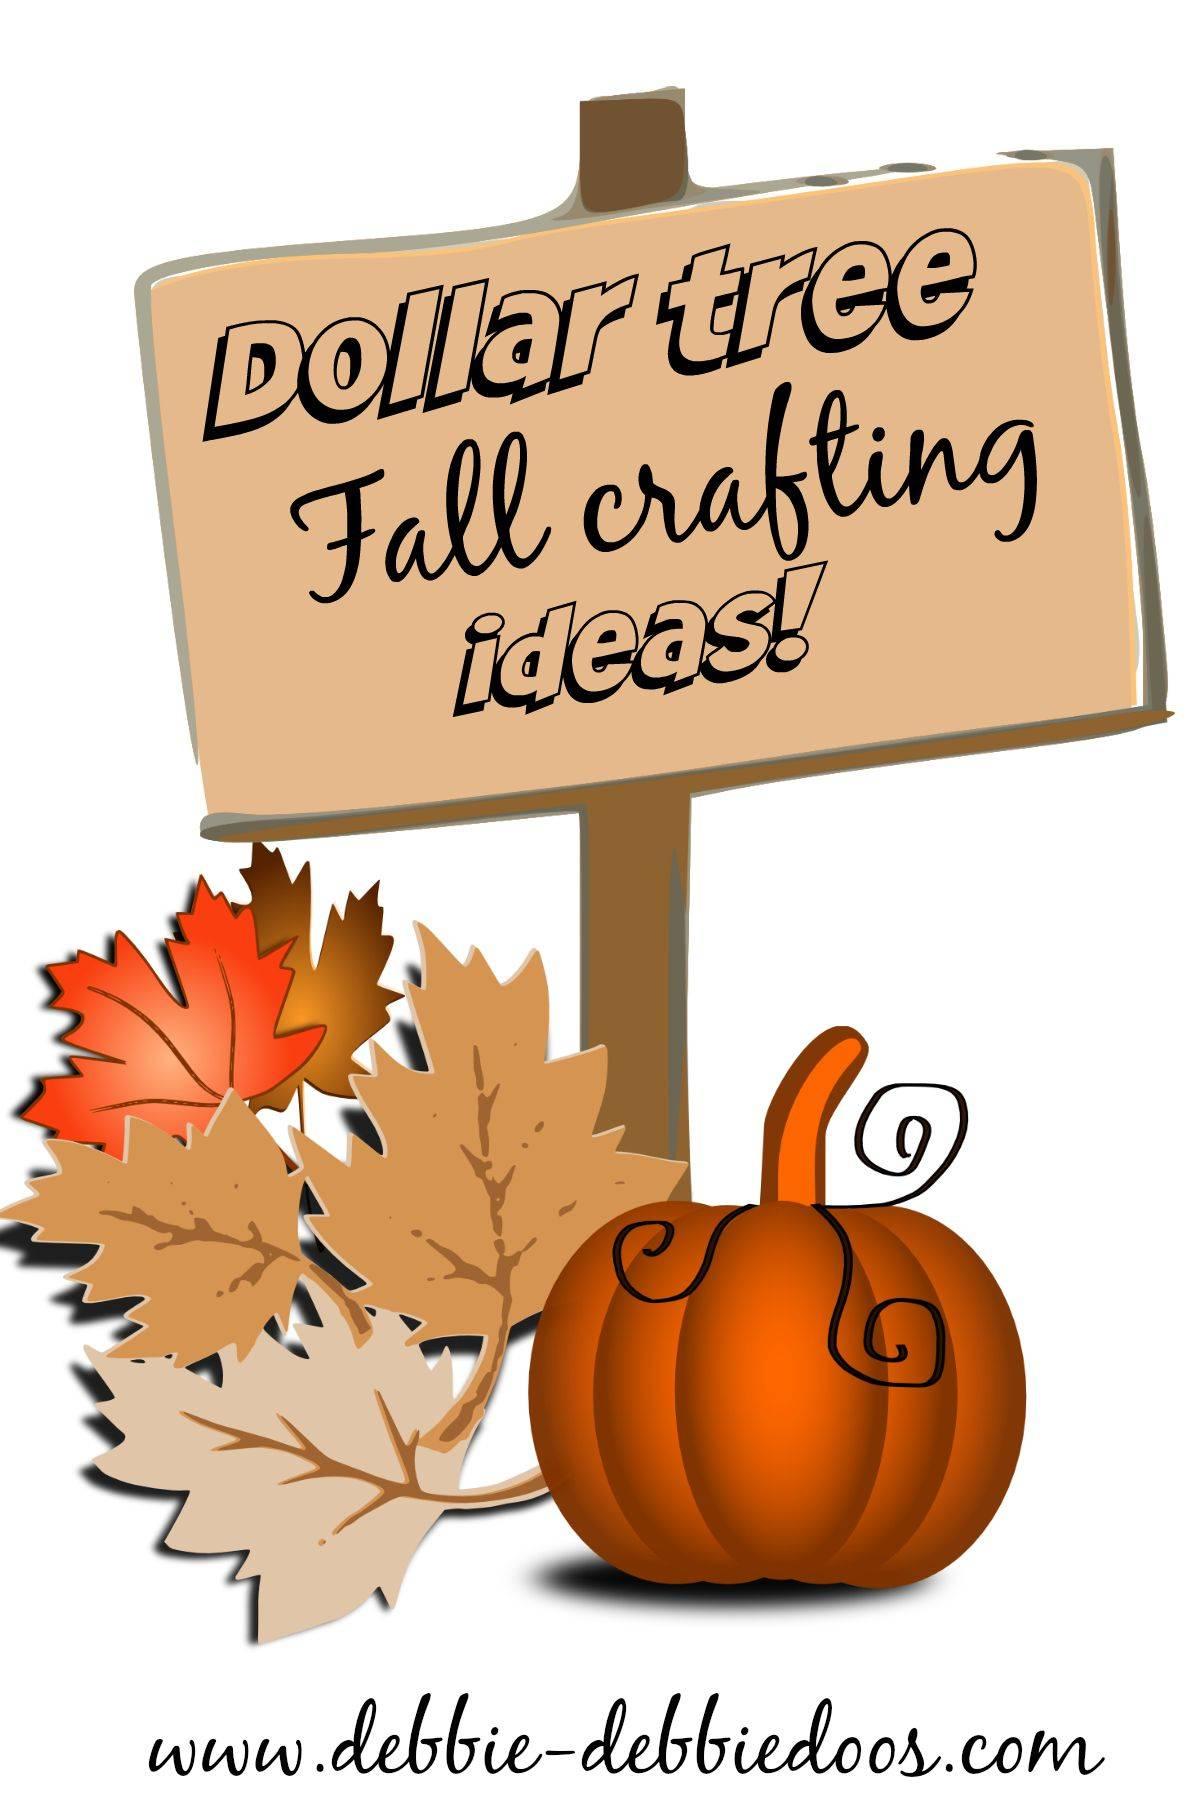 Glass vase pumpkin idea debbiedoos for Thanksgiving decorations ideas for office